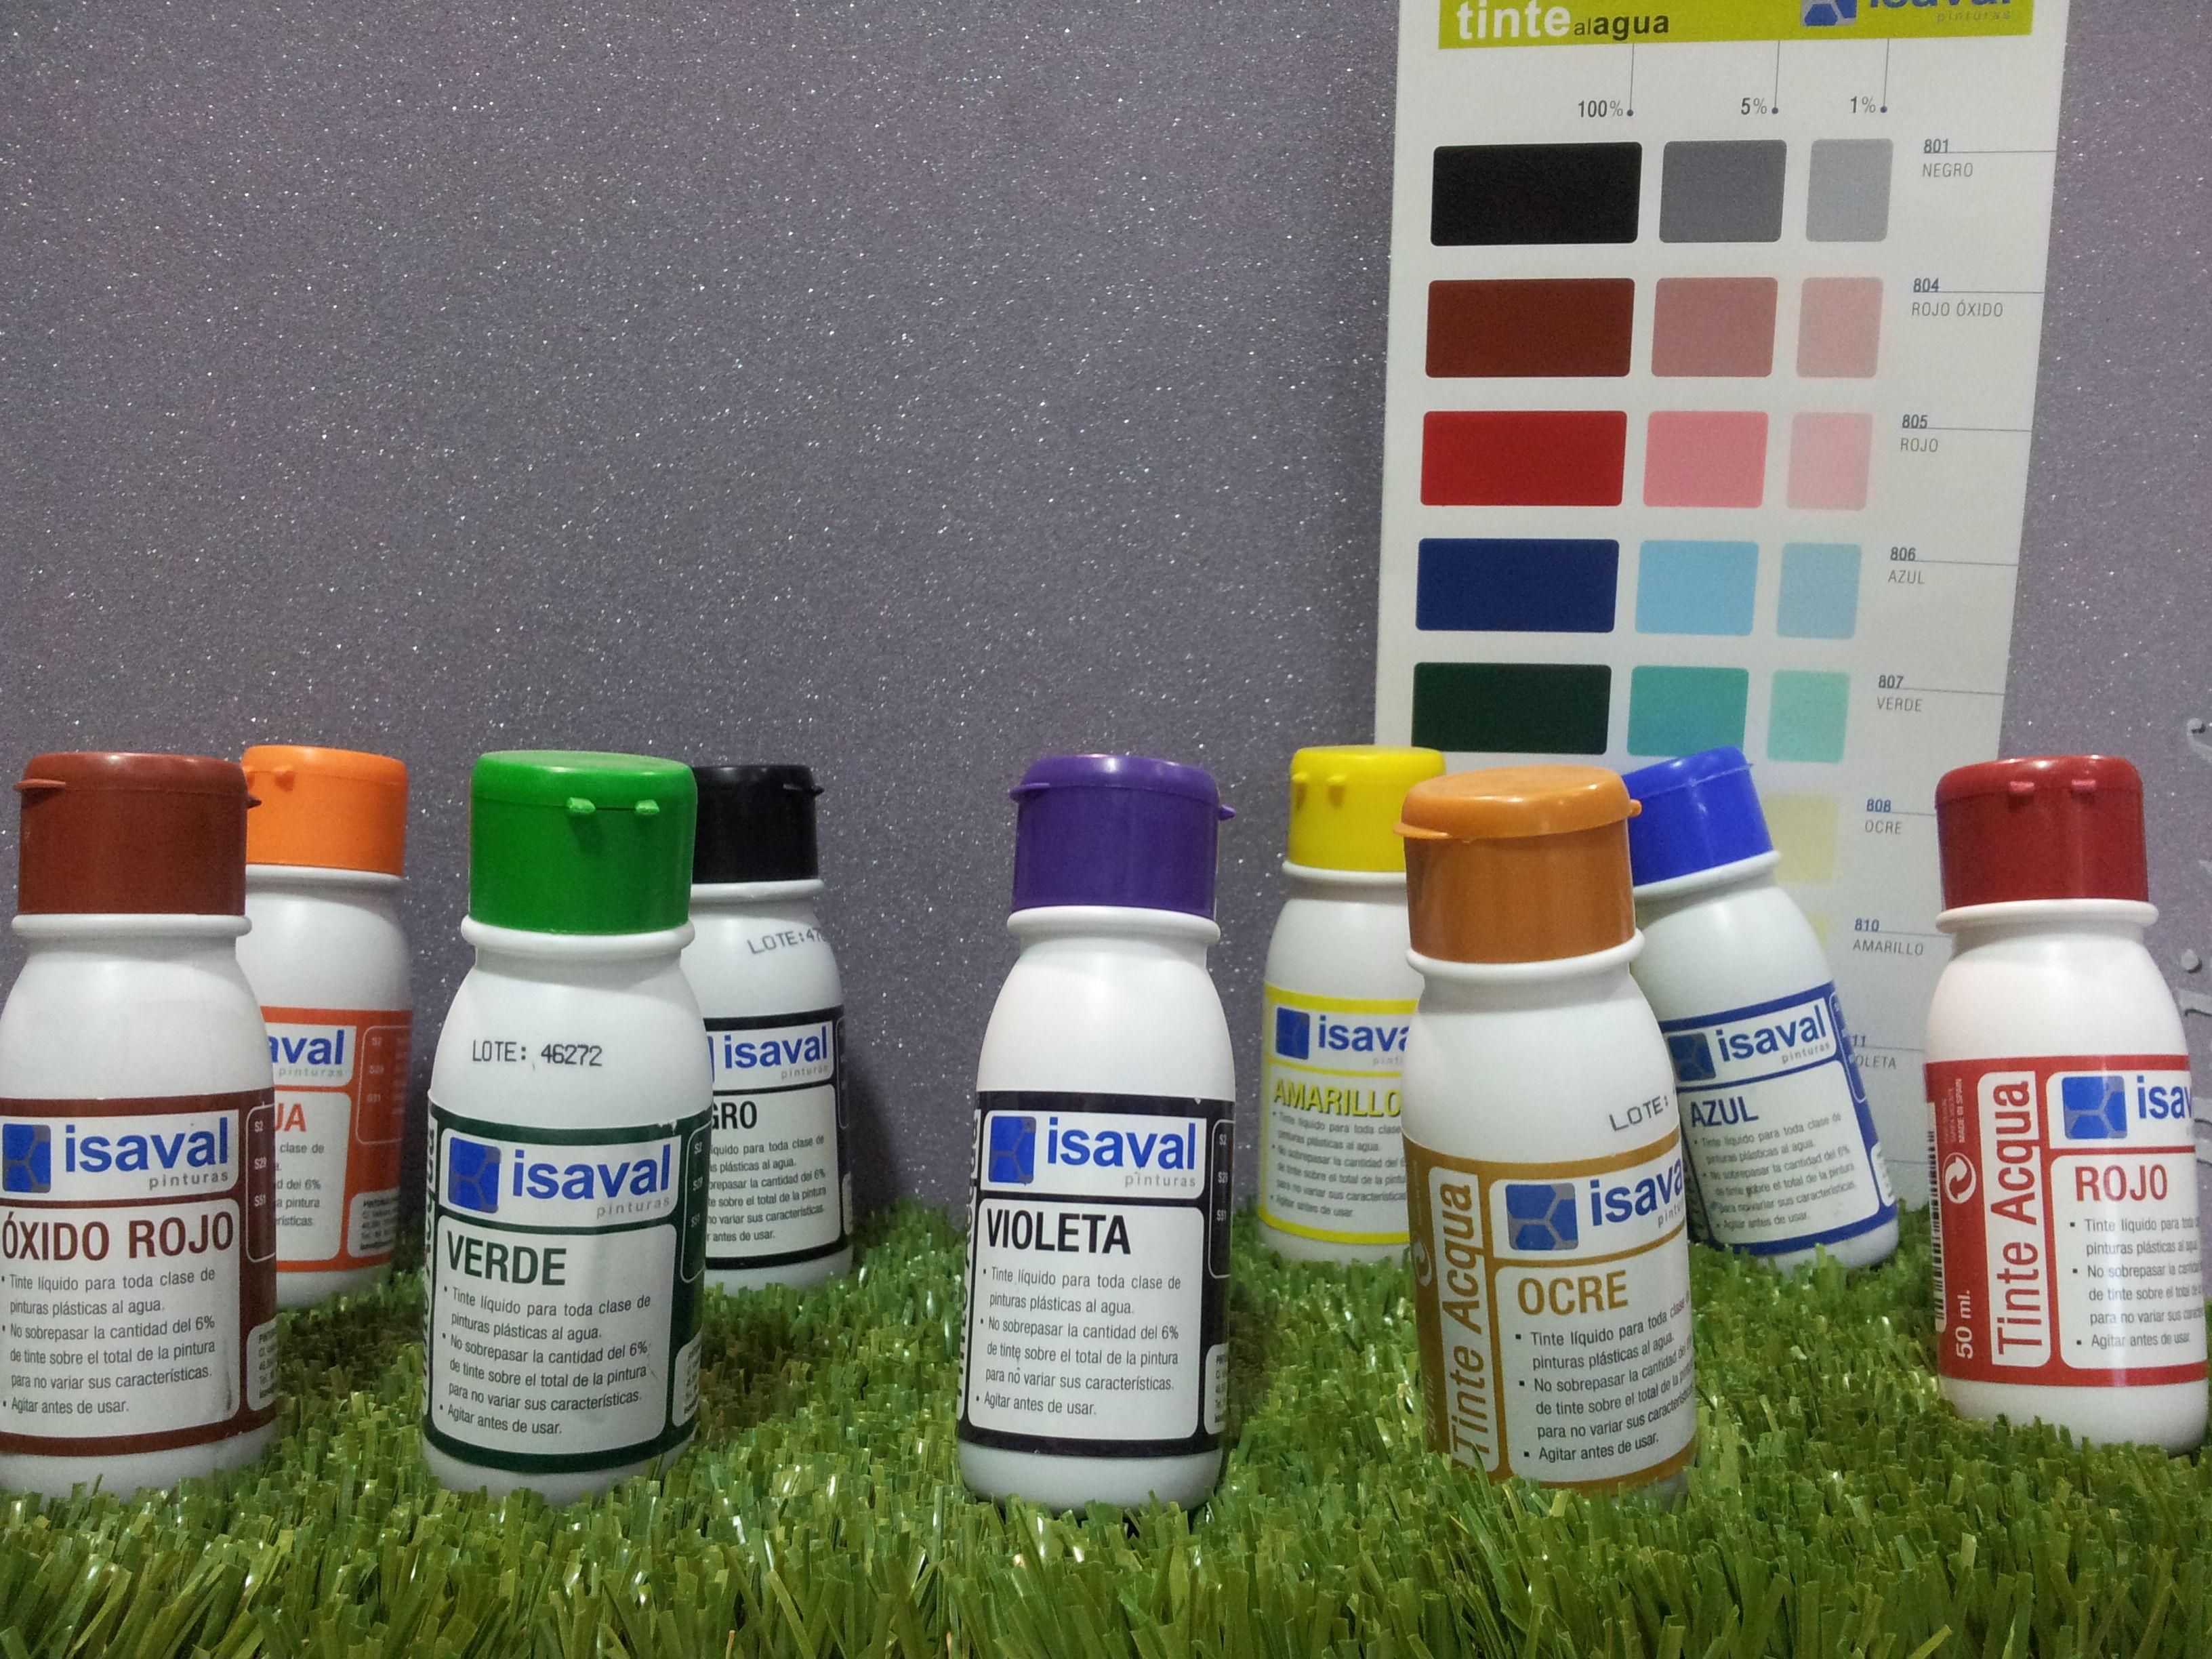 Tintes Acqua ISAVAL